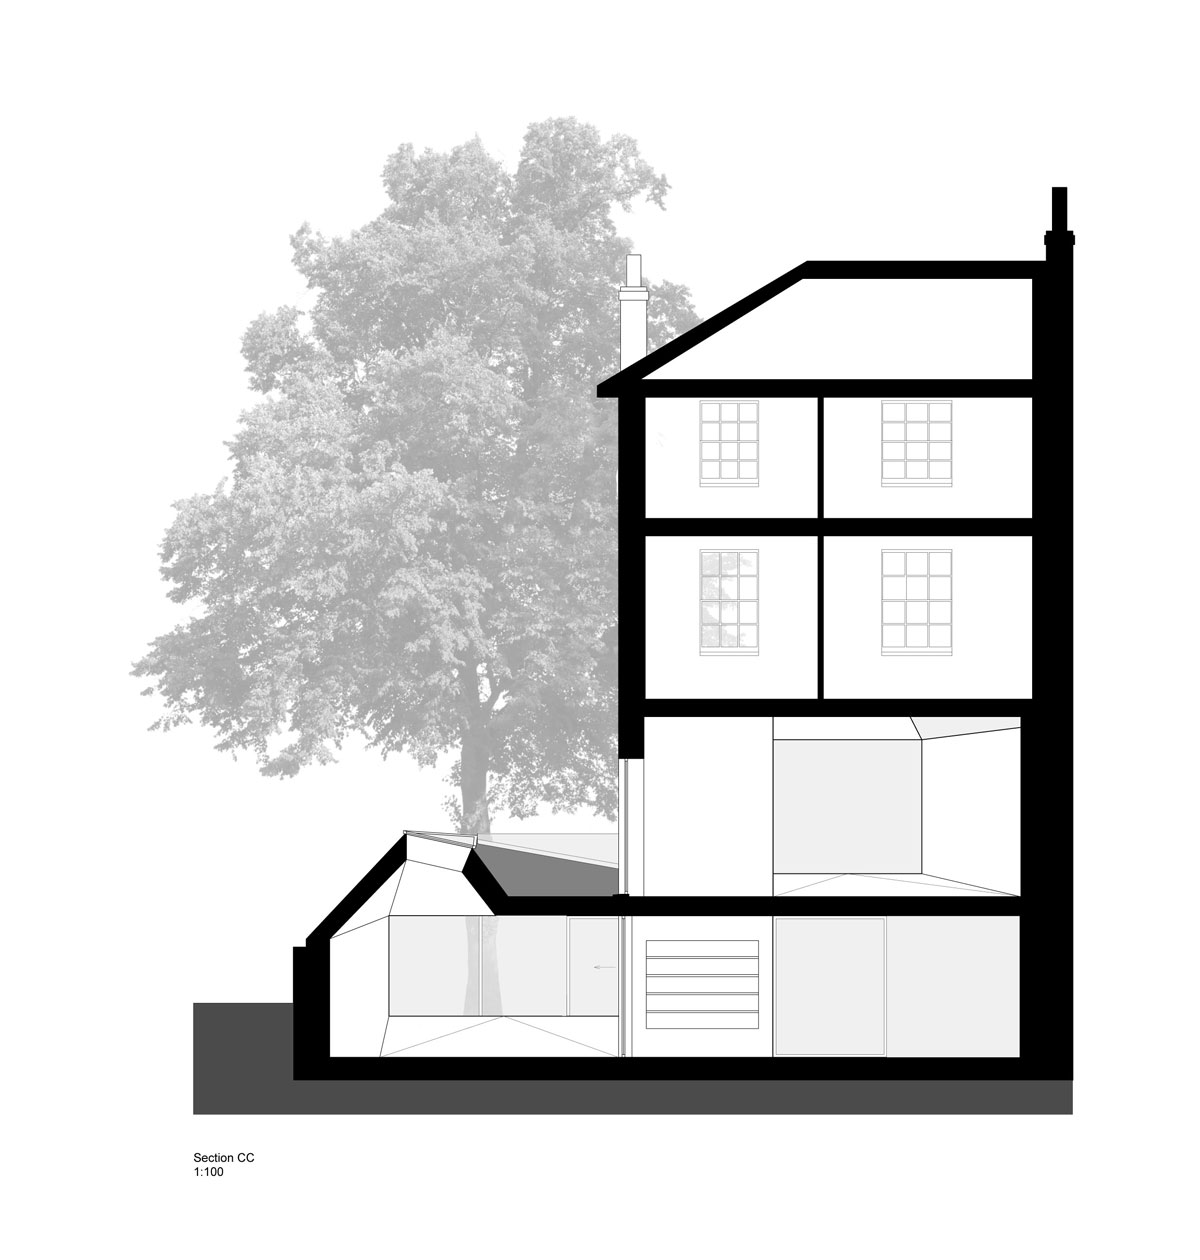 Alison Brooks Architects - Lens House Section CC